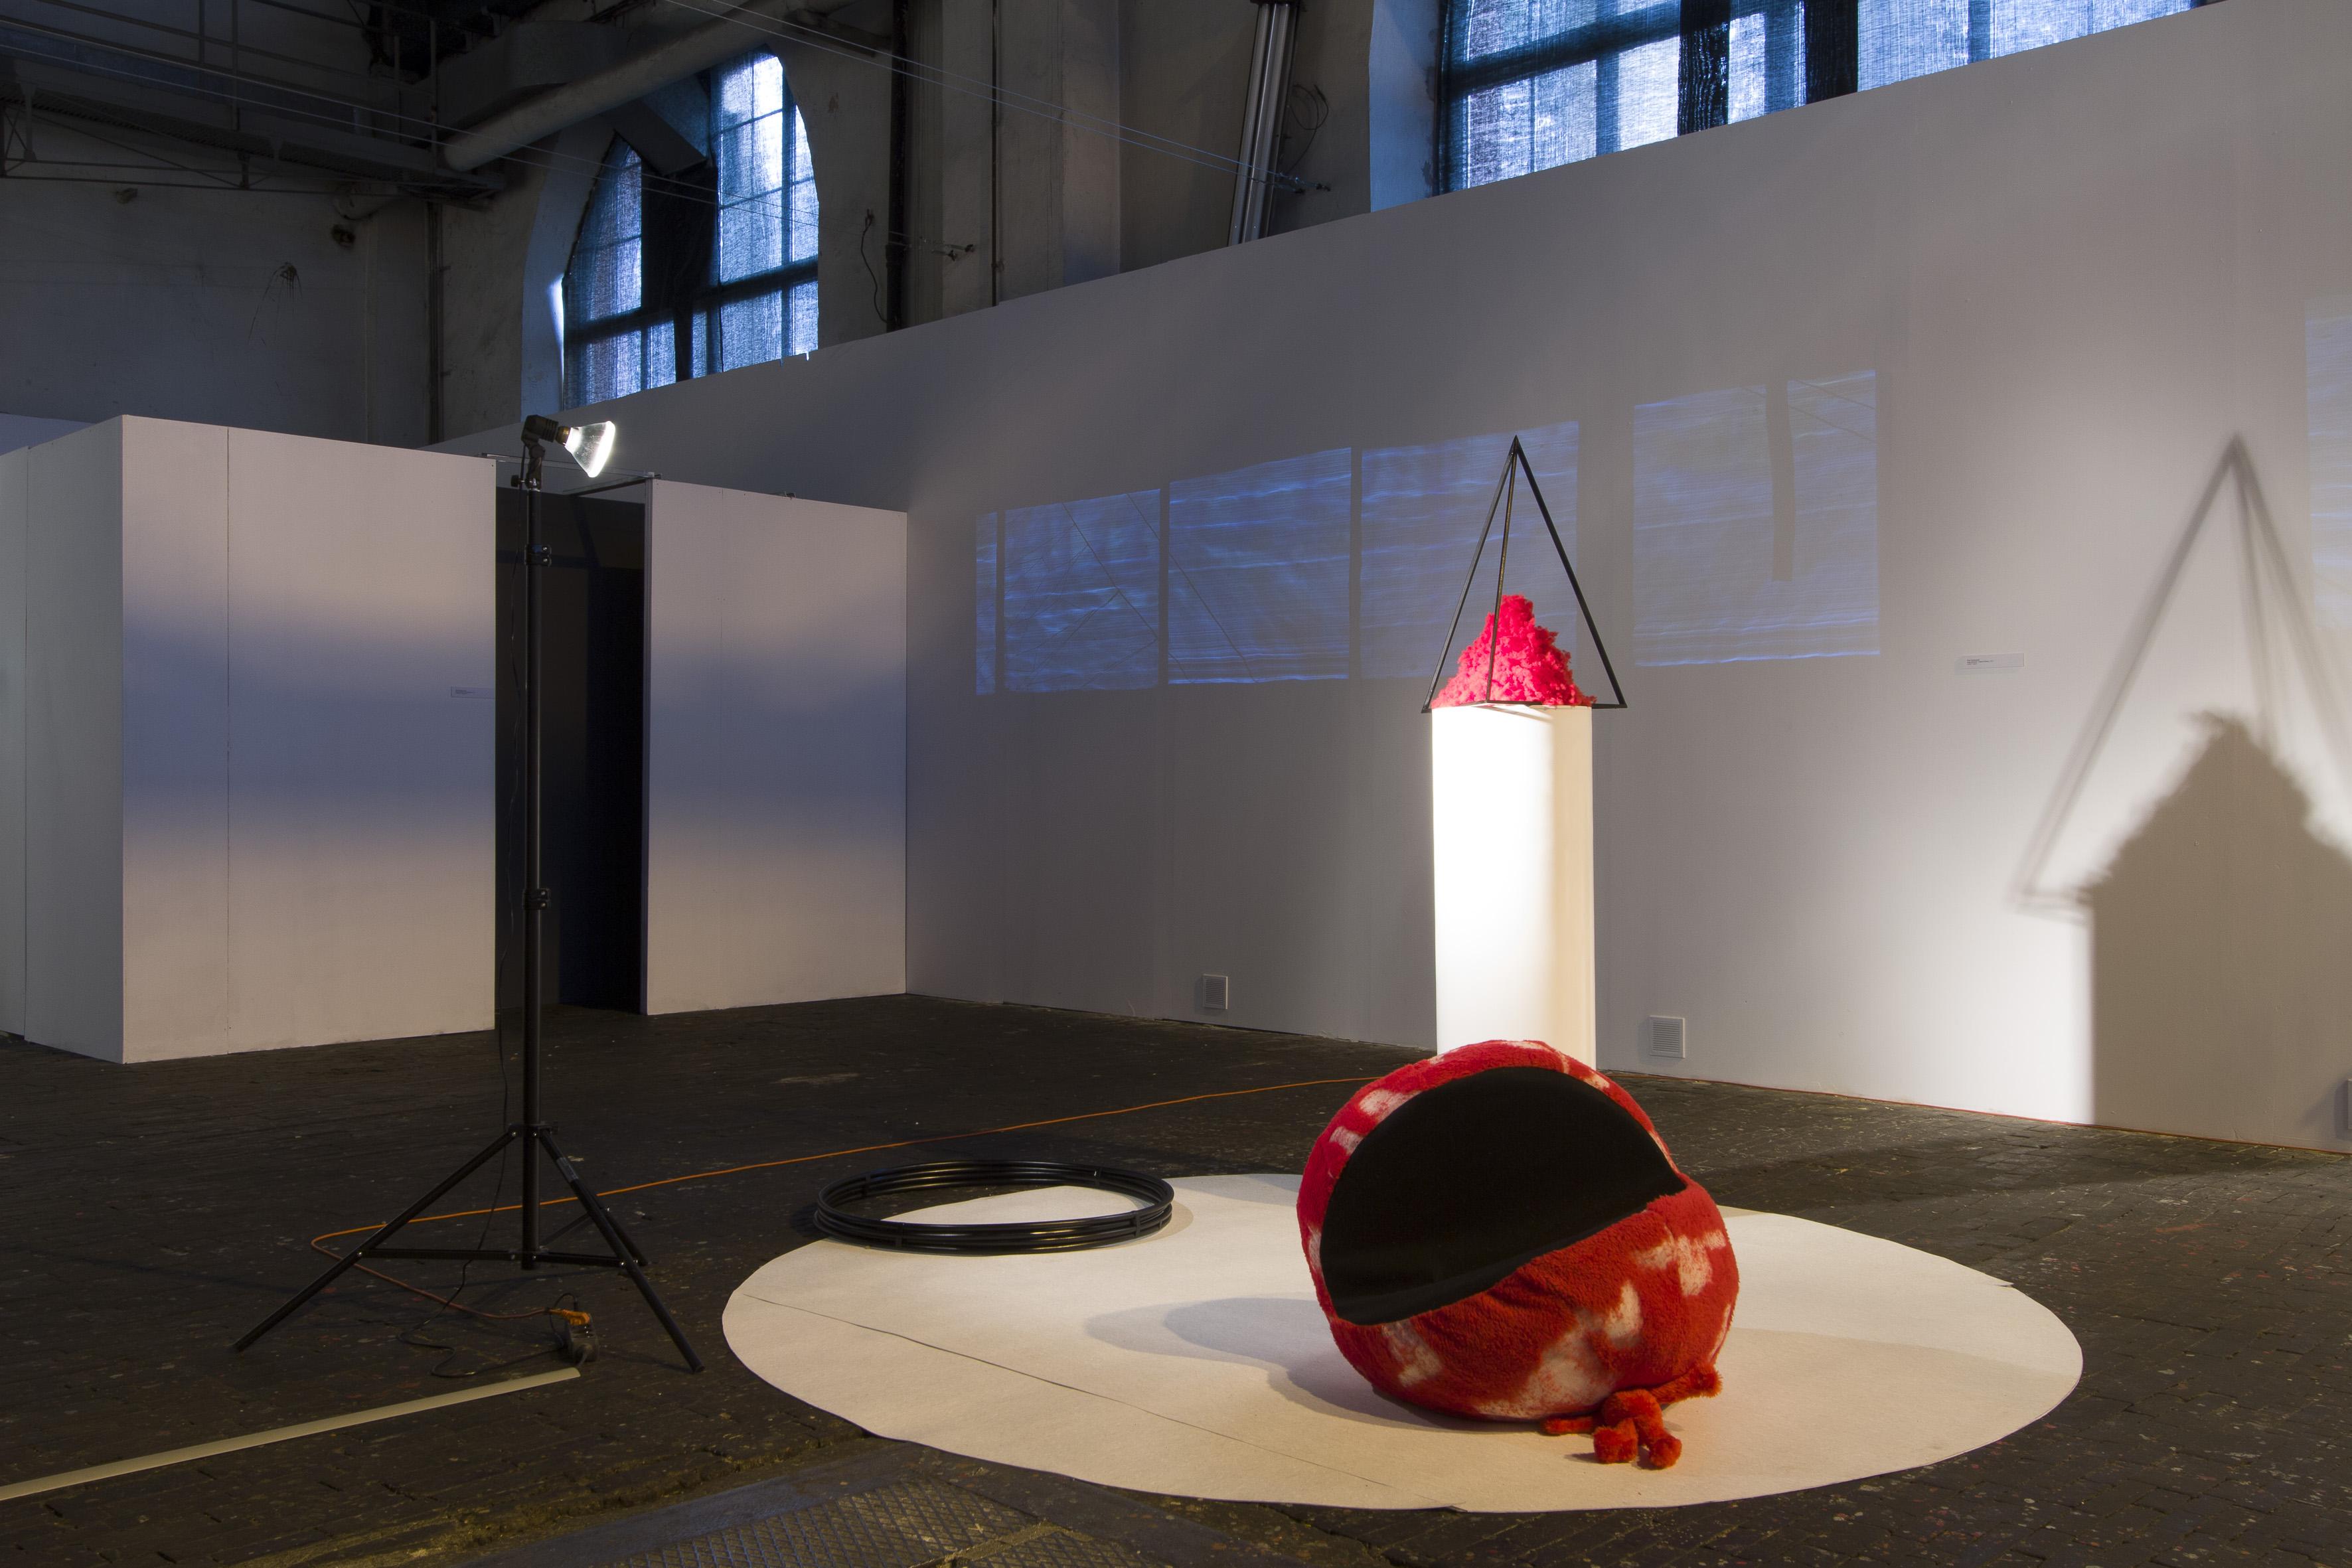 Piotr Grabowski, Naked flame, 2013